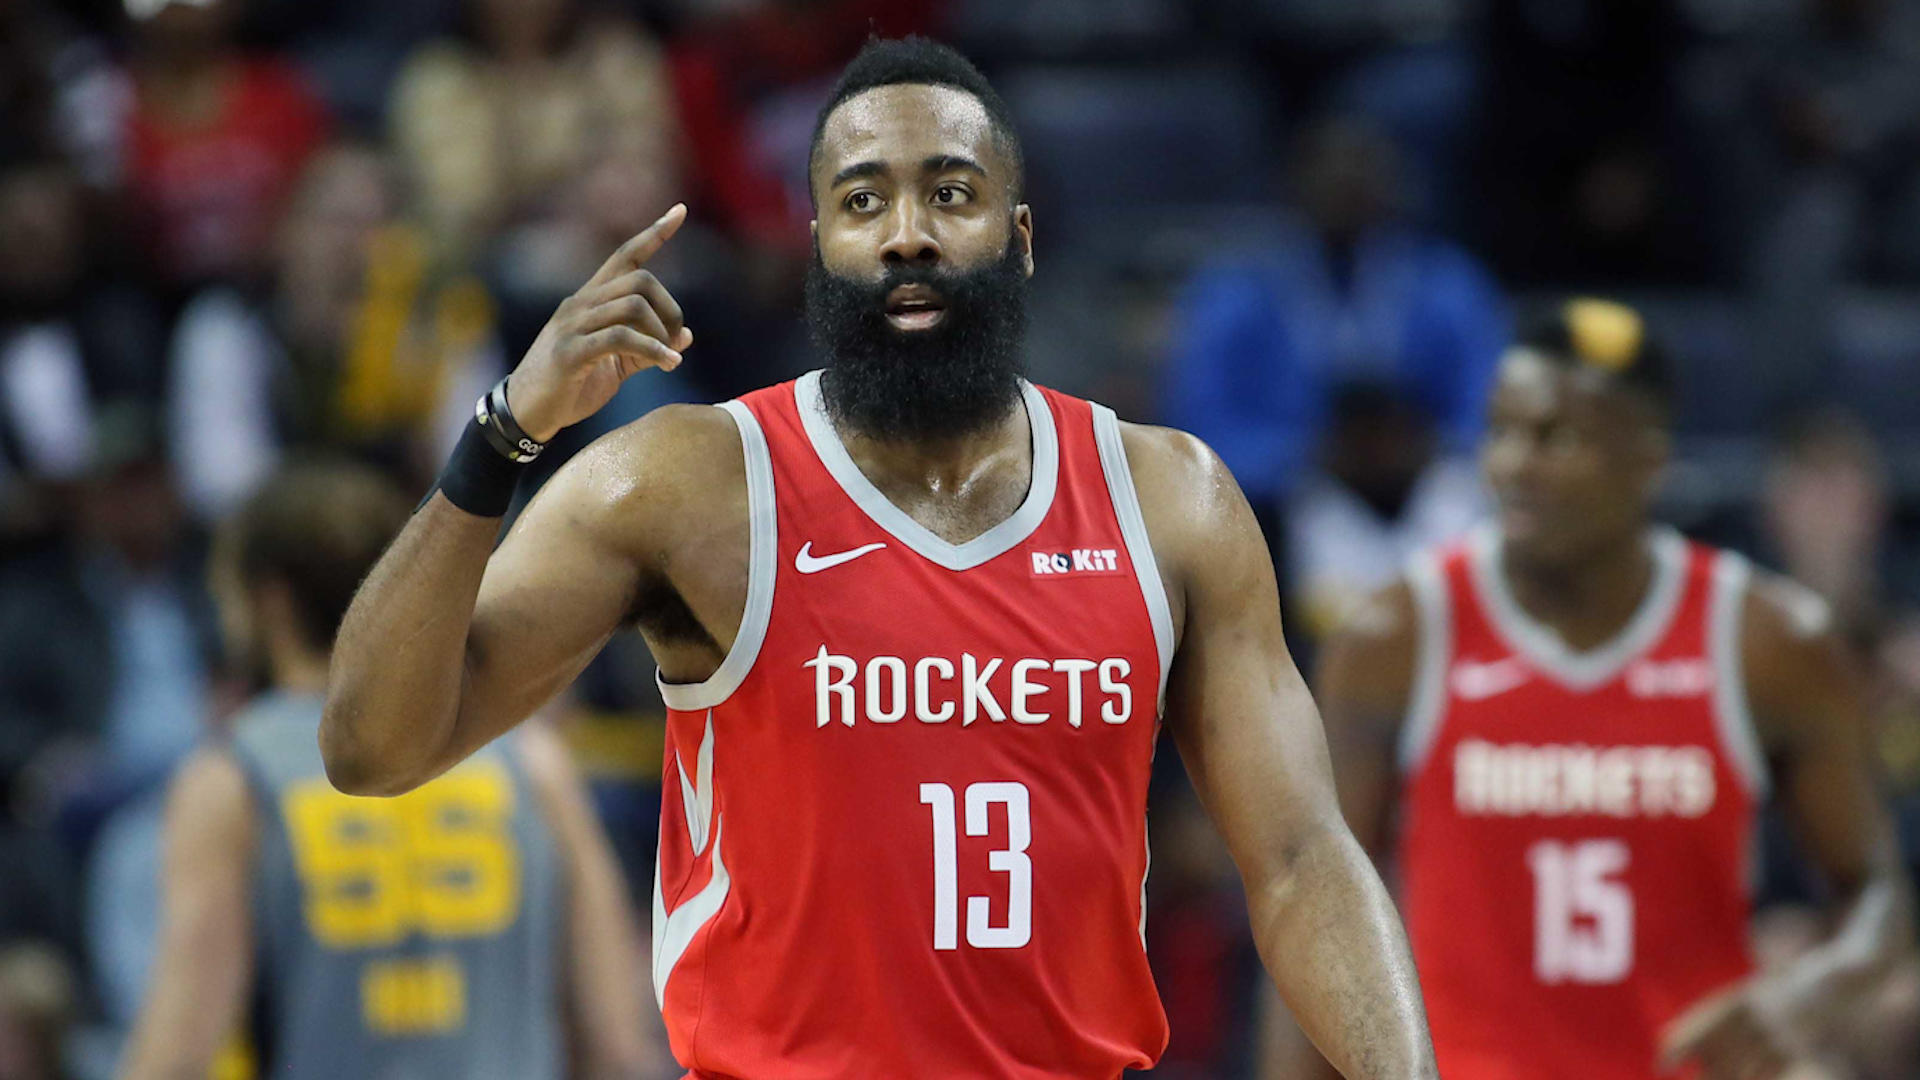 Rockets vs. Bucks odds, line: NBA picks, predictions from computer model on 65-48 run